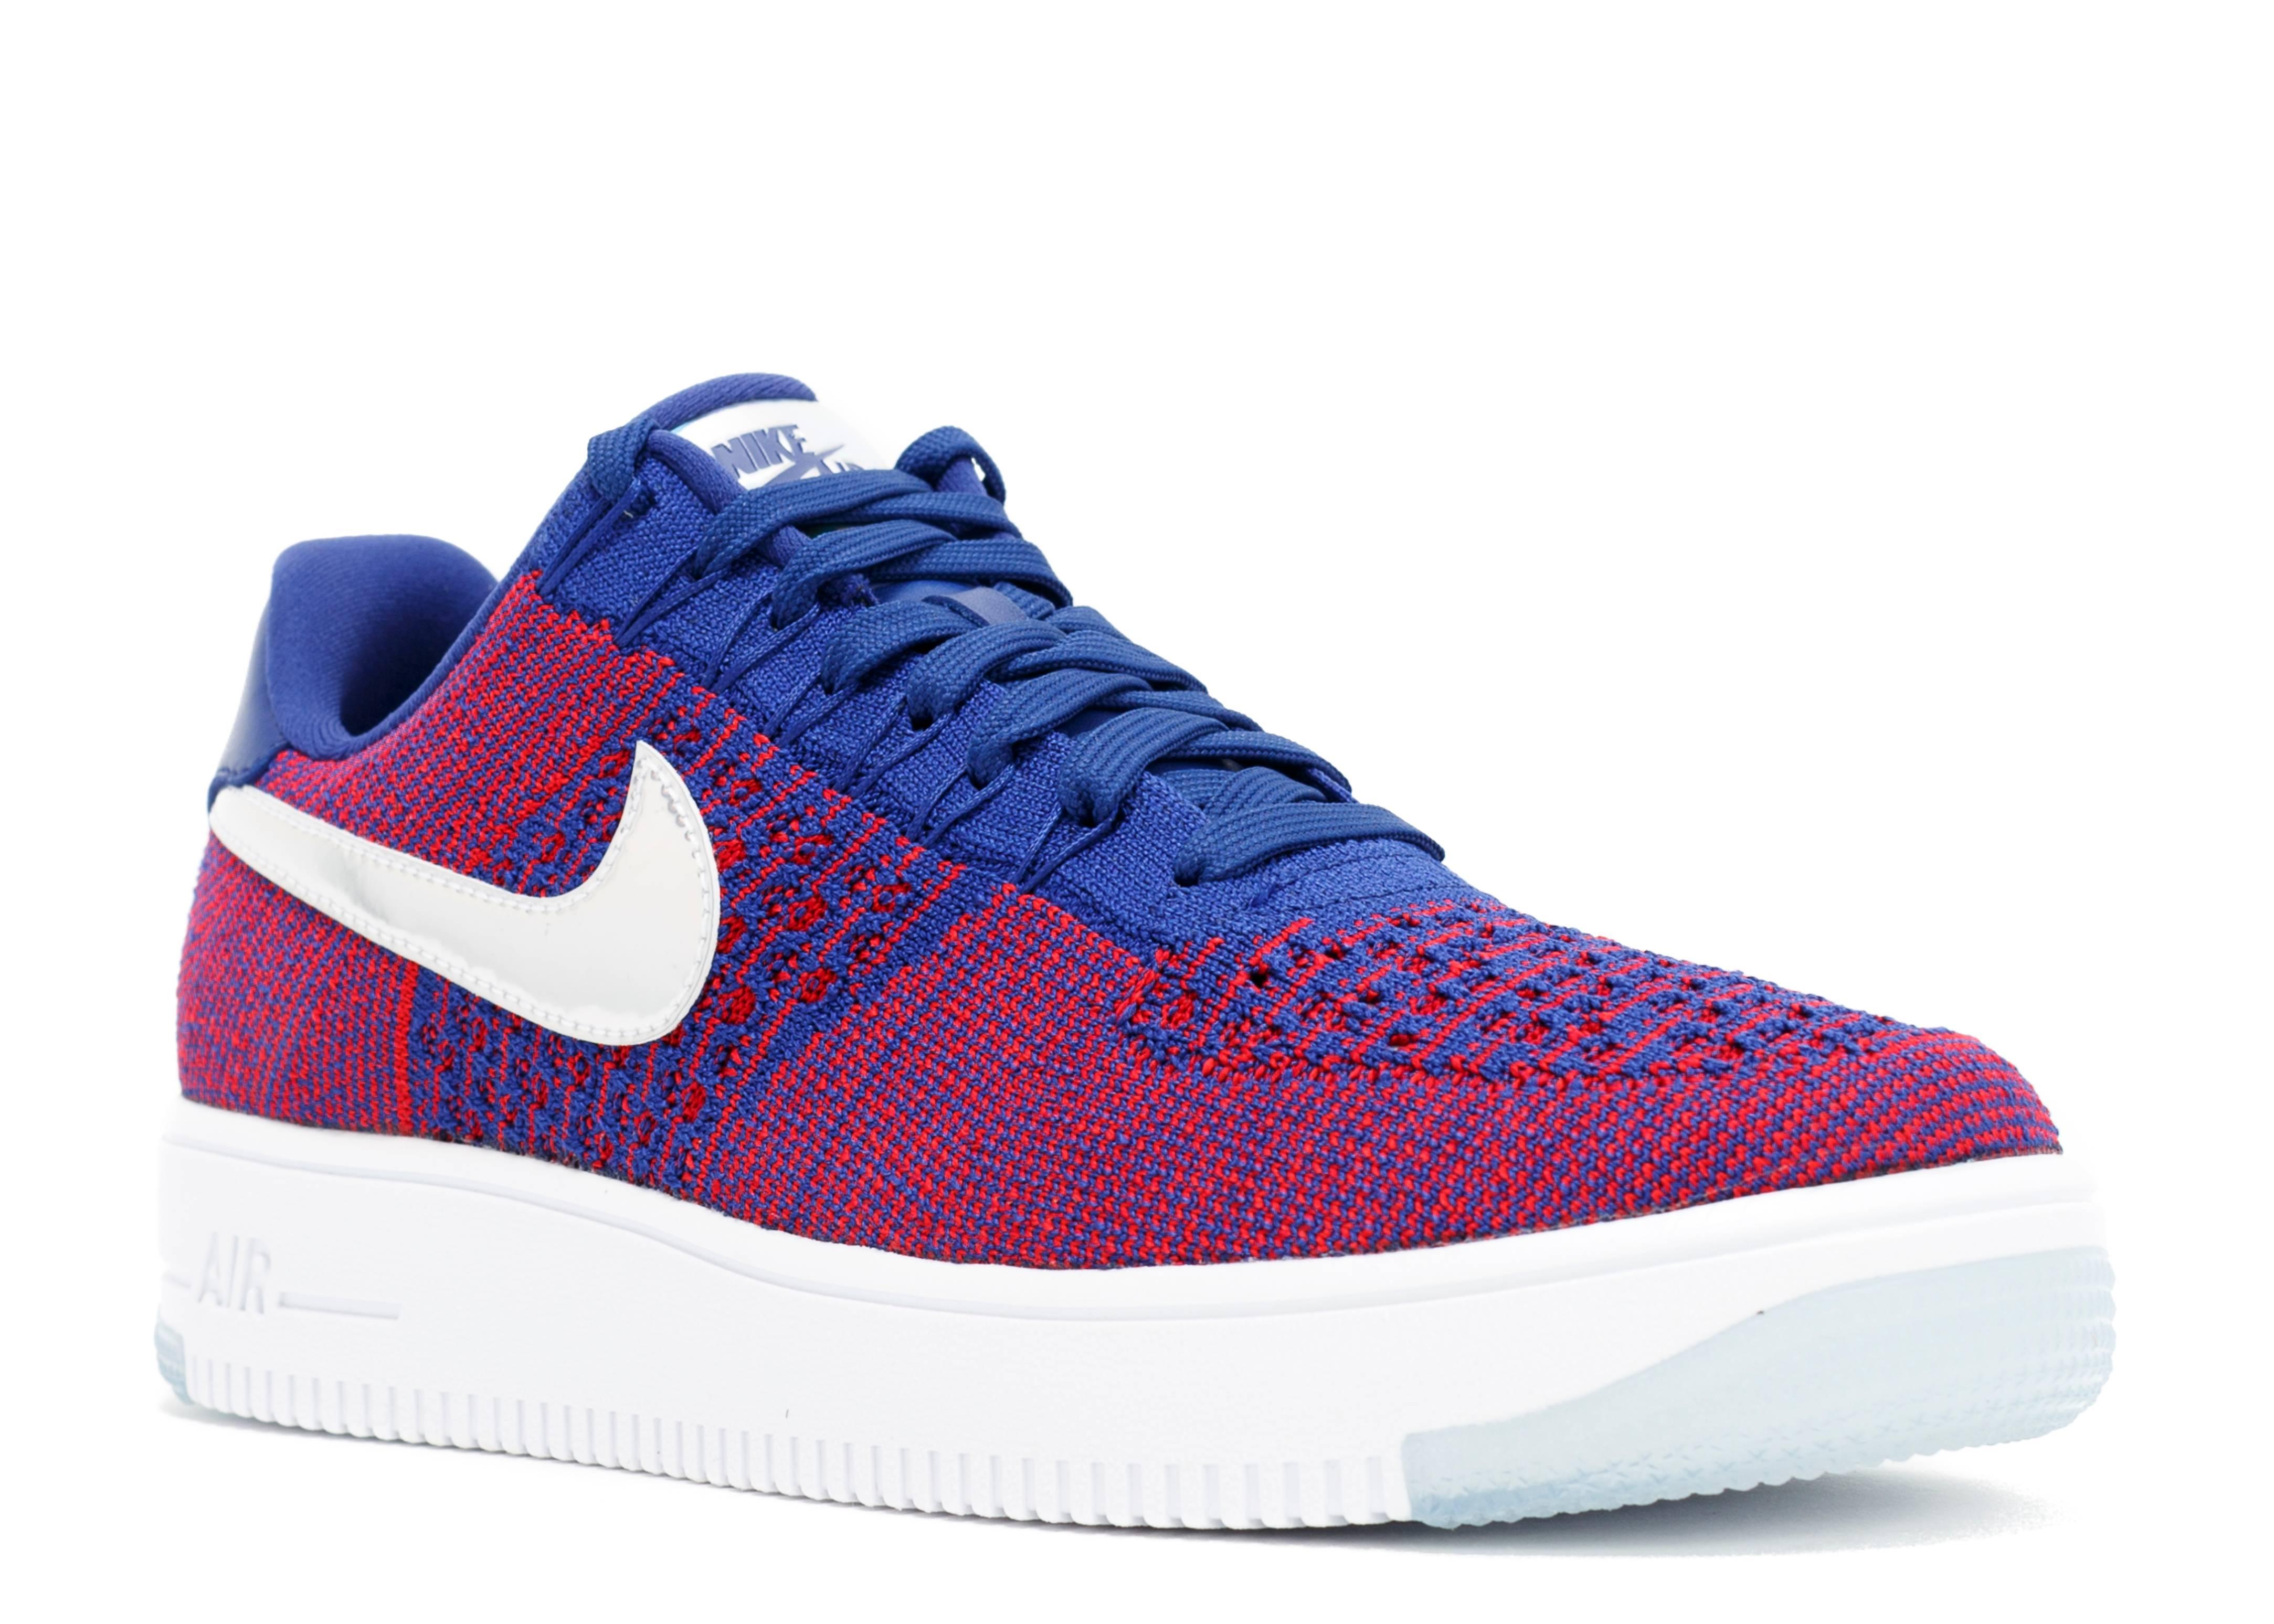 "Af1 Ultra Flyknit Low Prm ""olympic"" - Nike - 826577 601 ..."